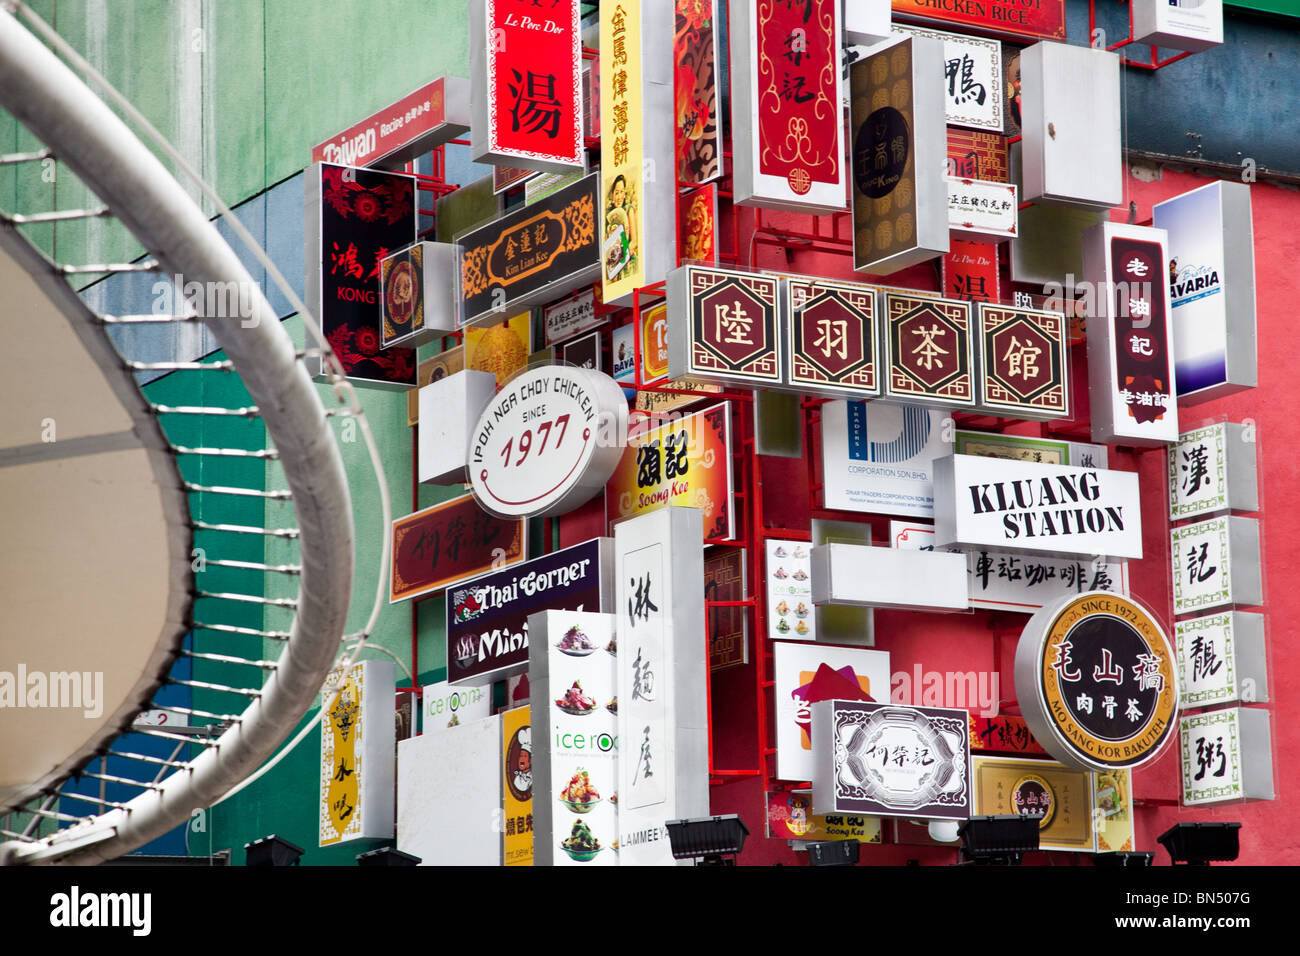 Lot 10 Hutong Food Court in Kuala Lampur, Malaysia - Stock Image